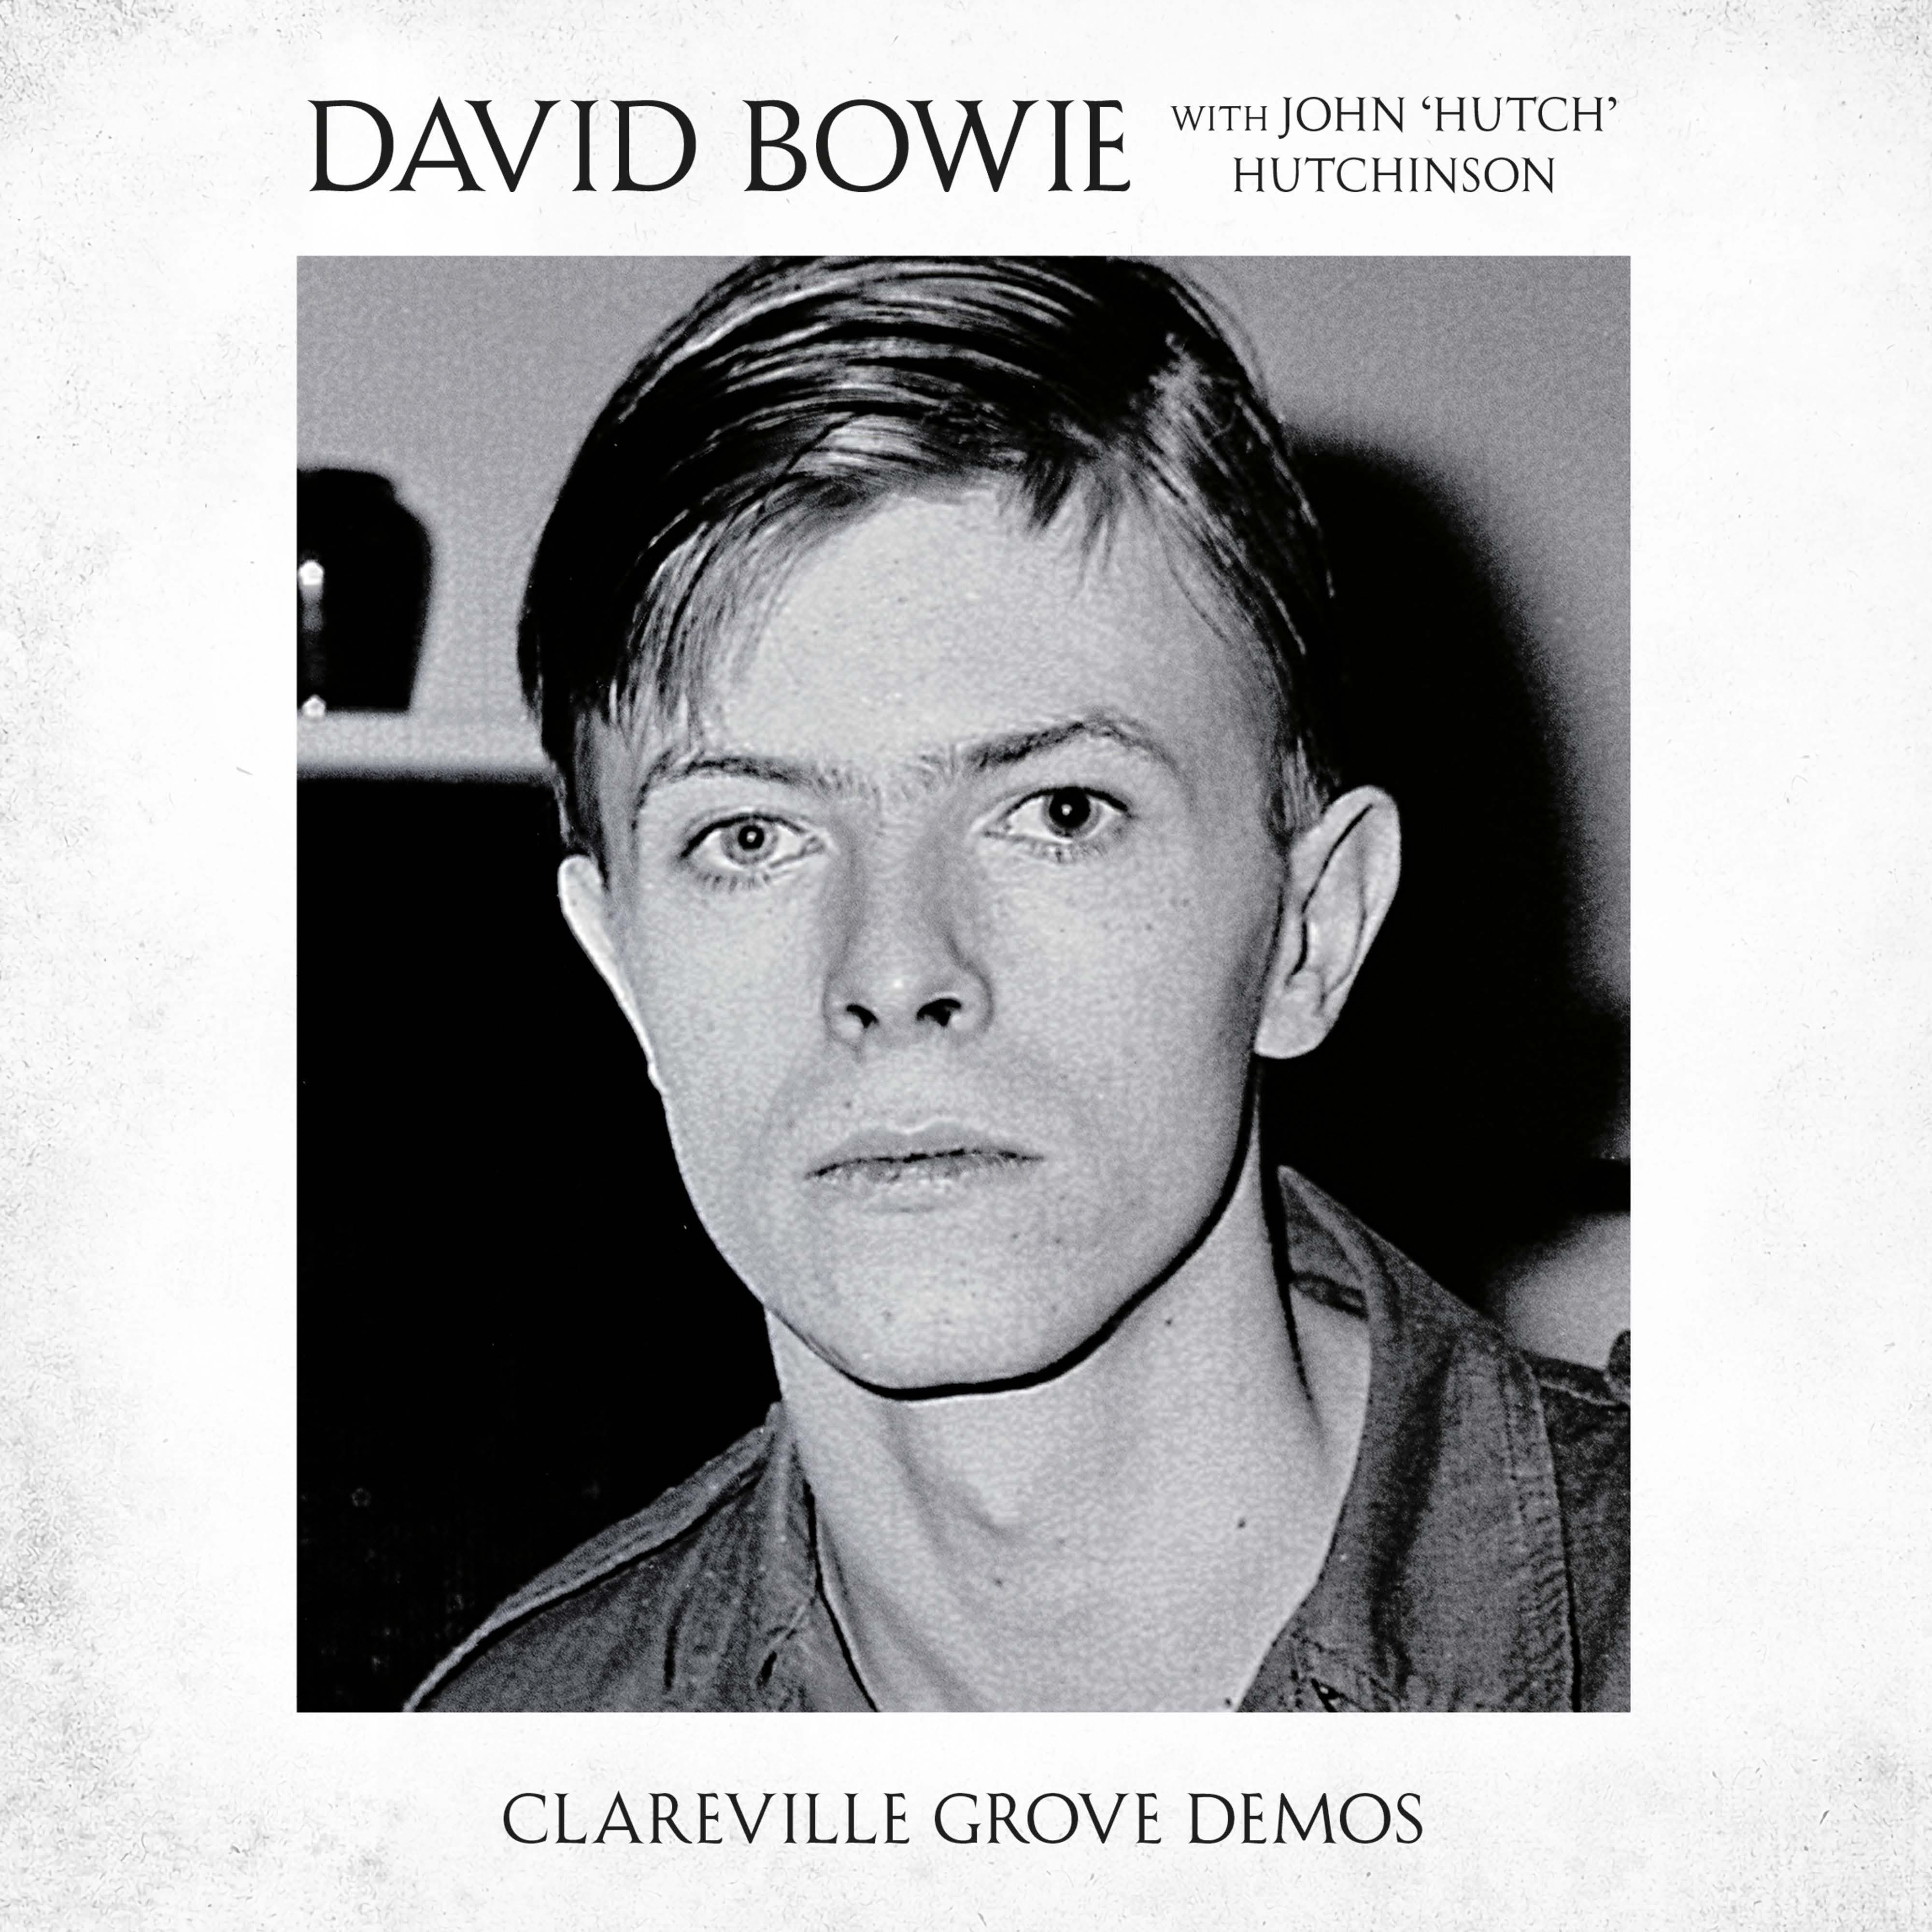 "David Bowie with John 'Hutch' Hutchinson Clareville Grove Demos 3x7"" Vinyl Singles Box Set"